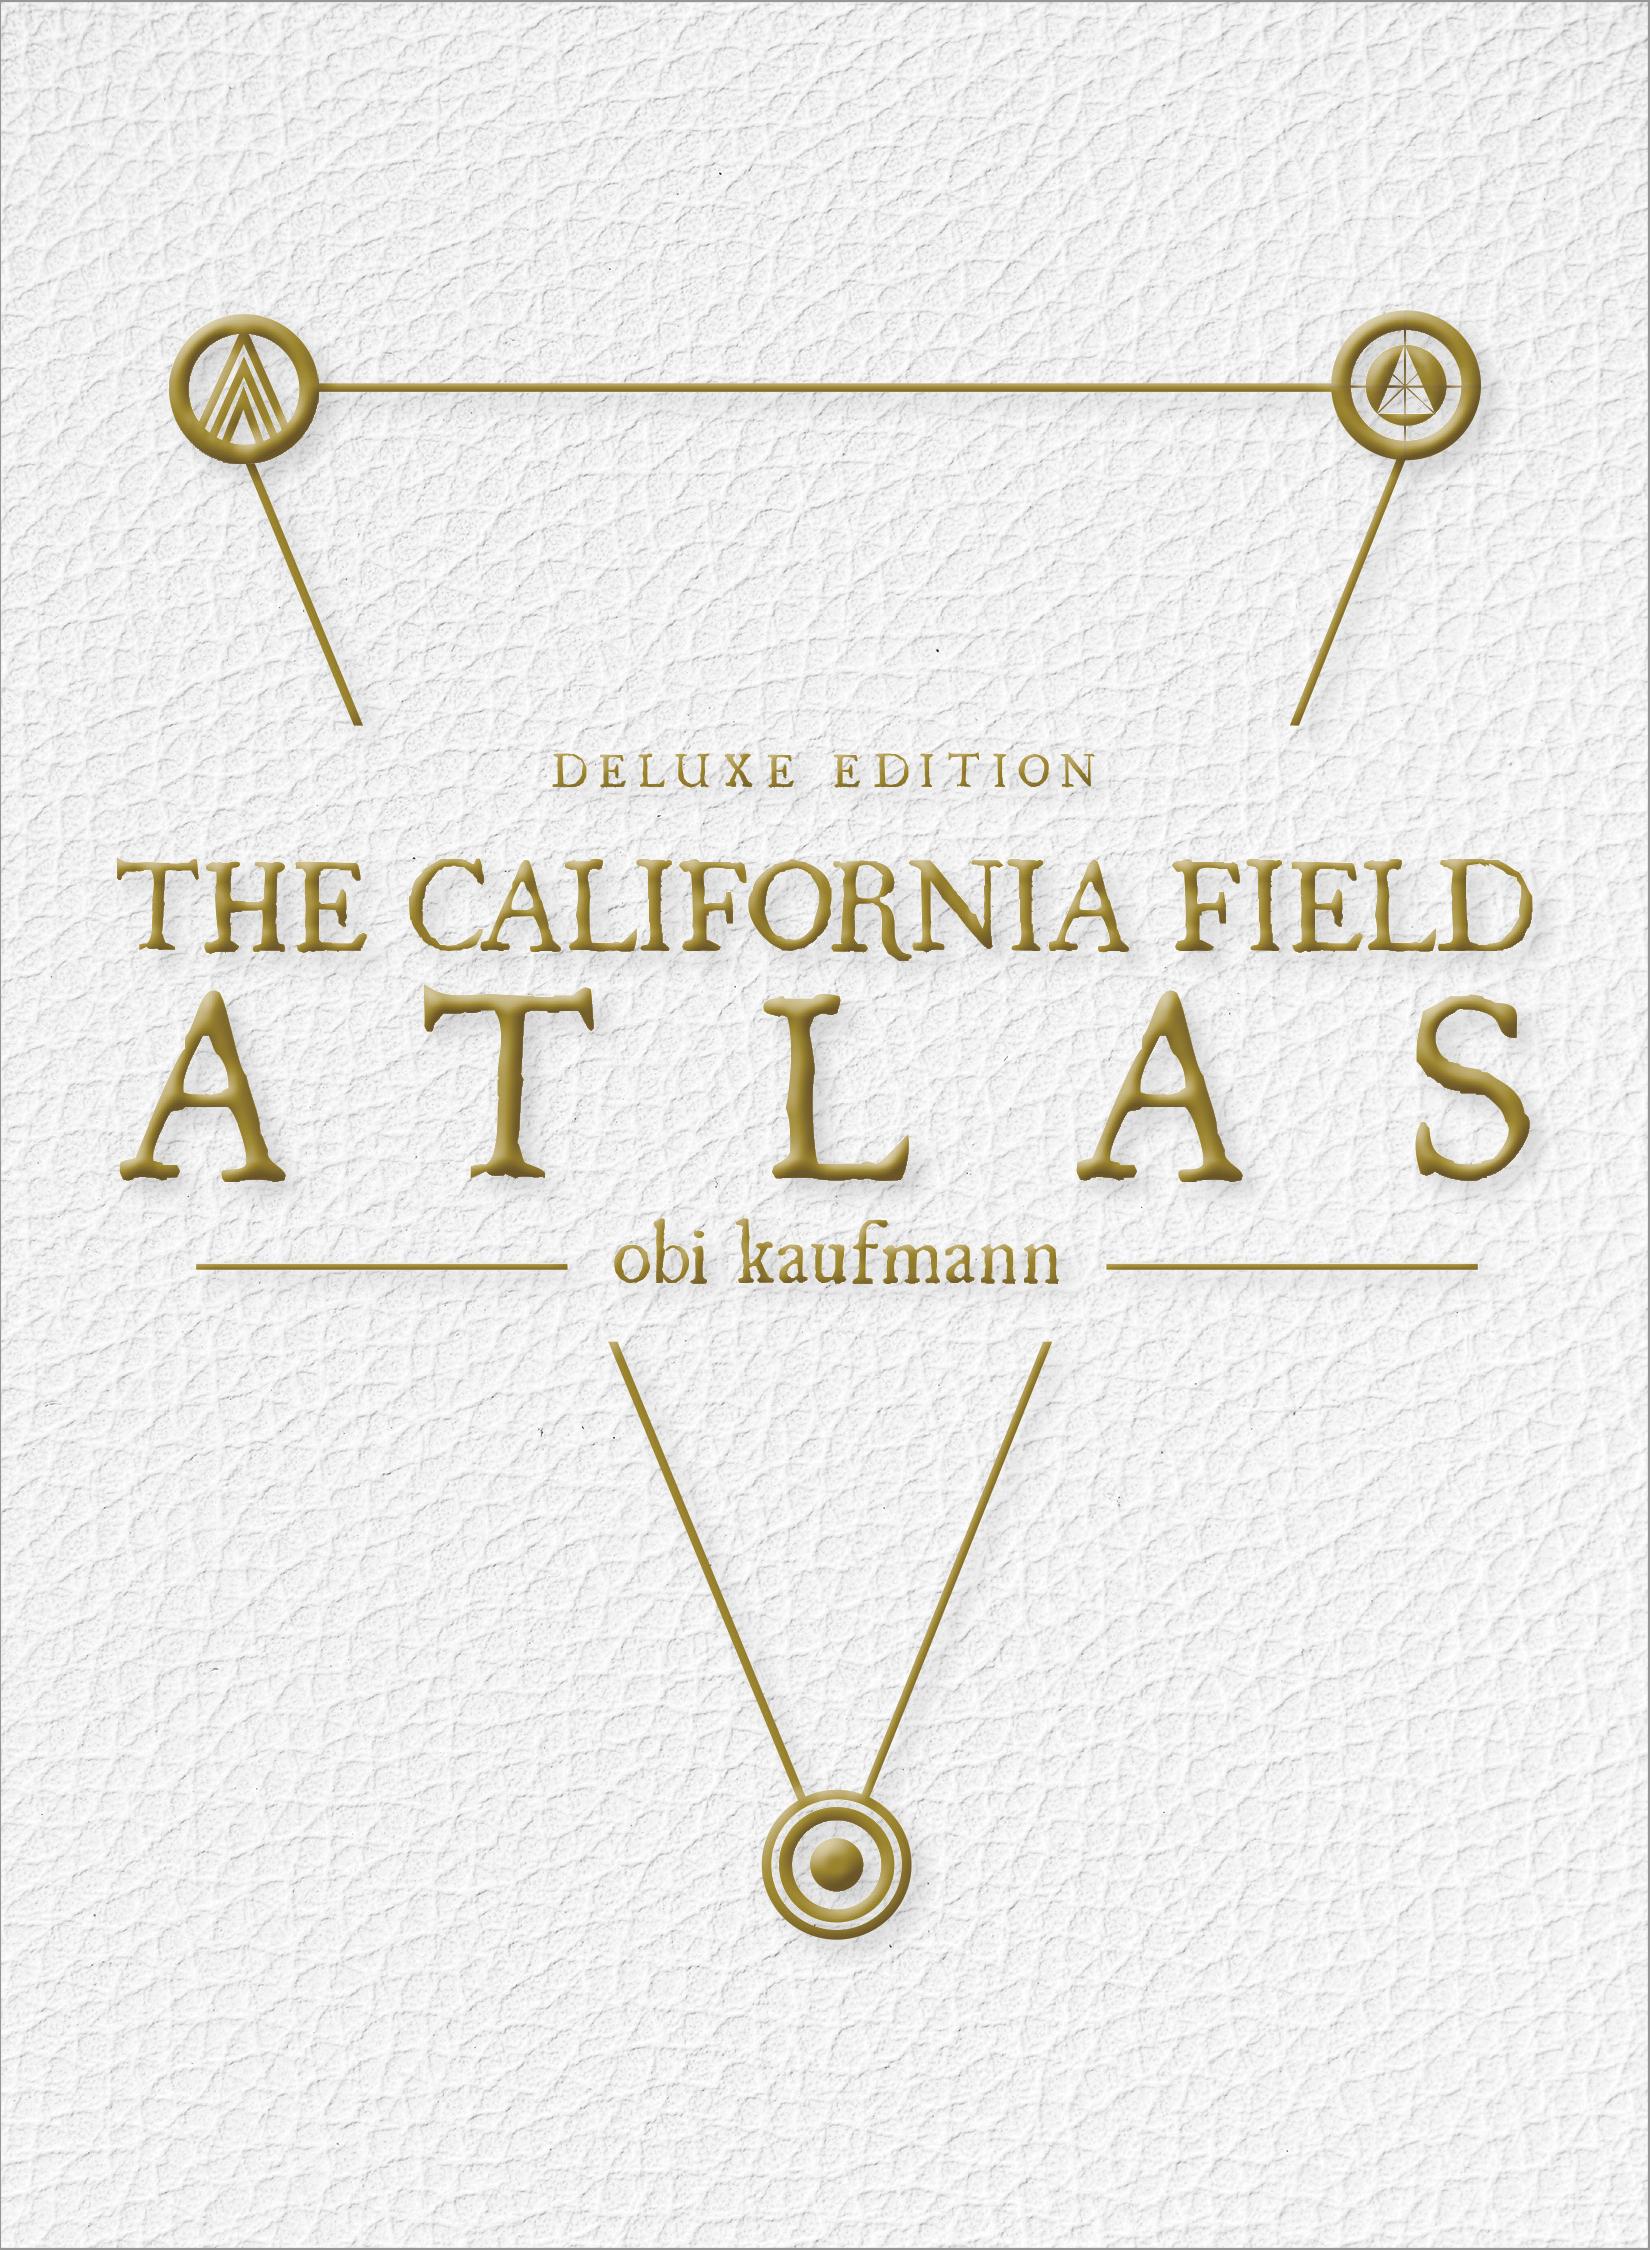 The California Field Atlas: Deluxe Edition